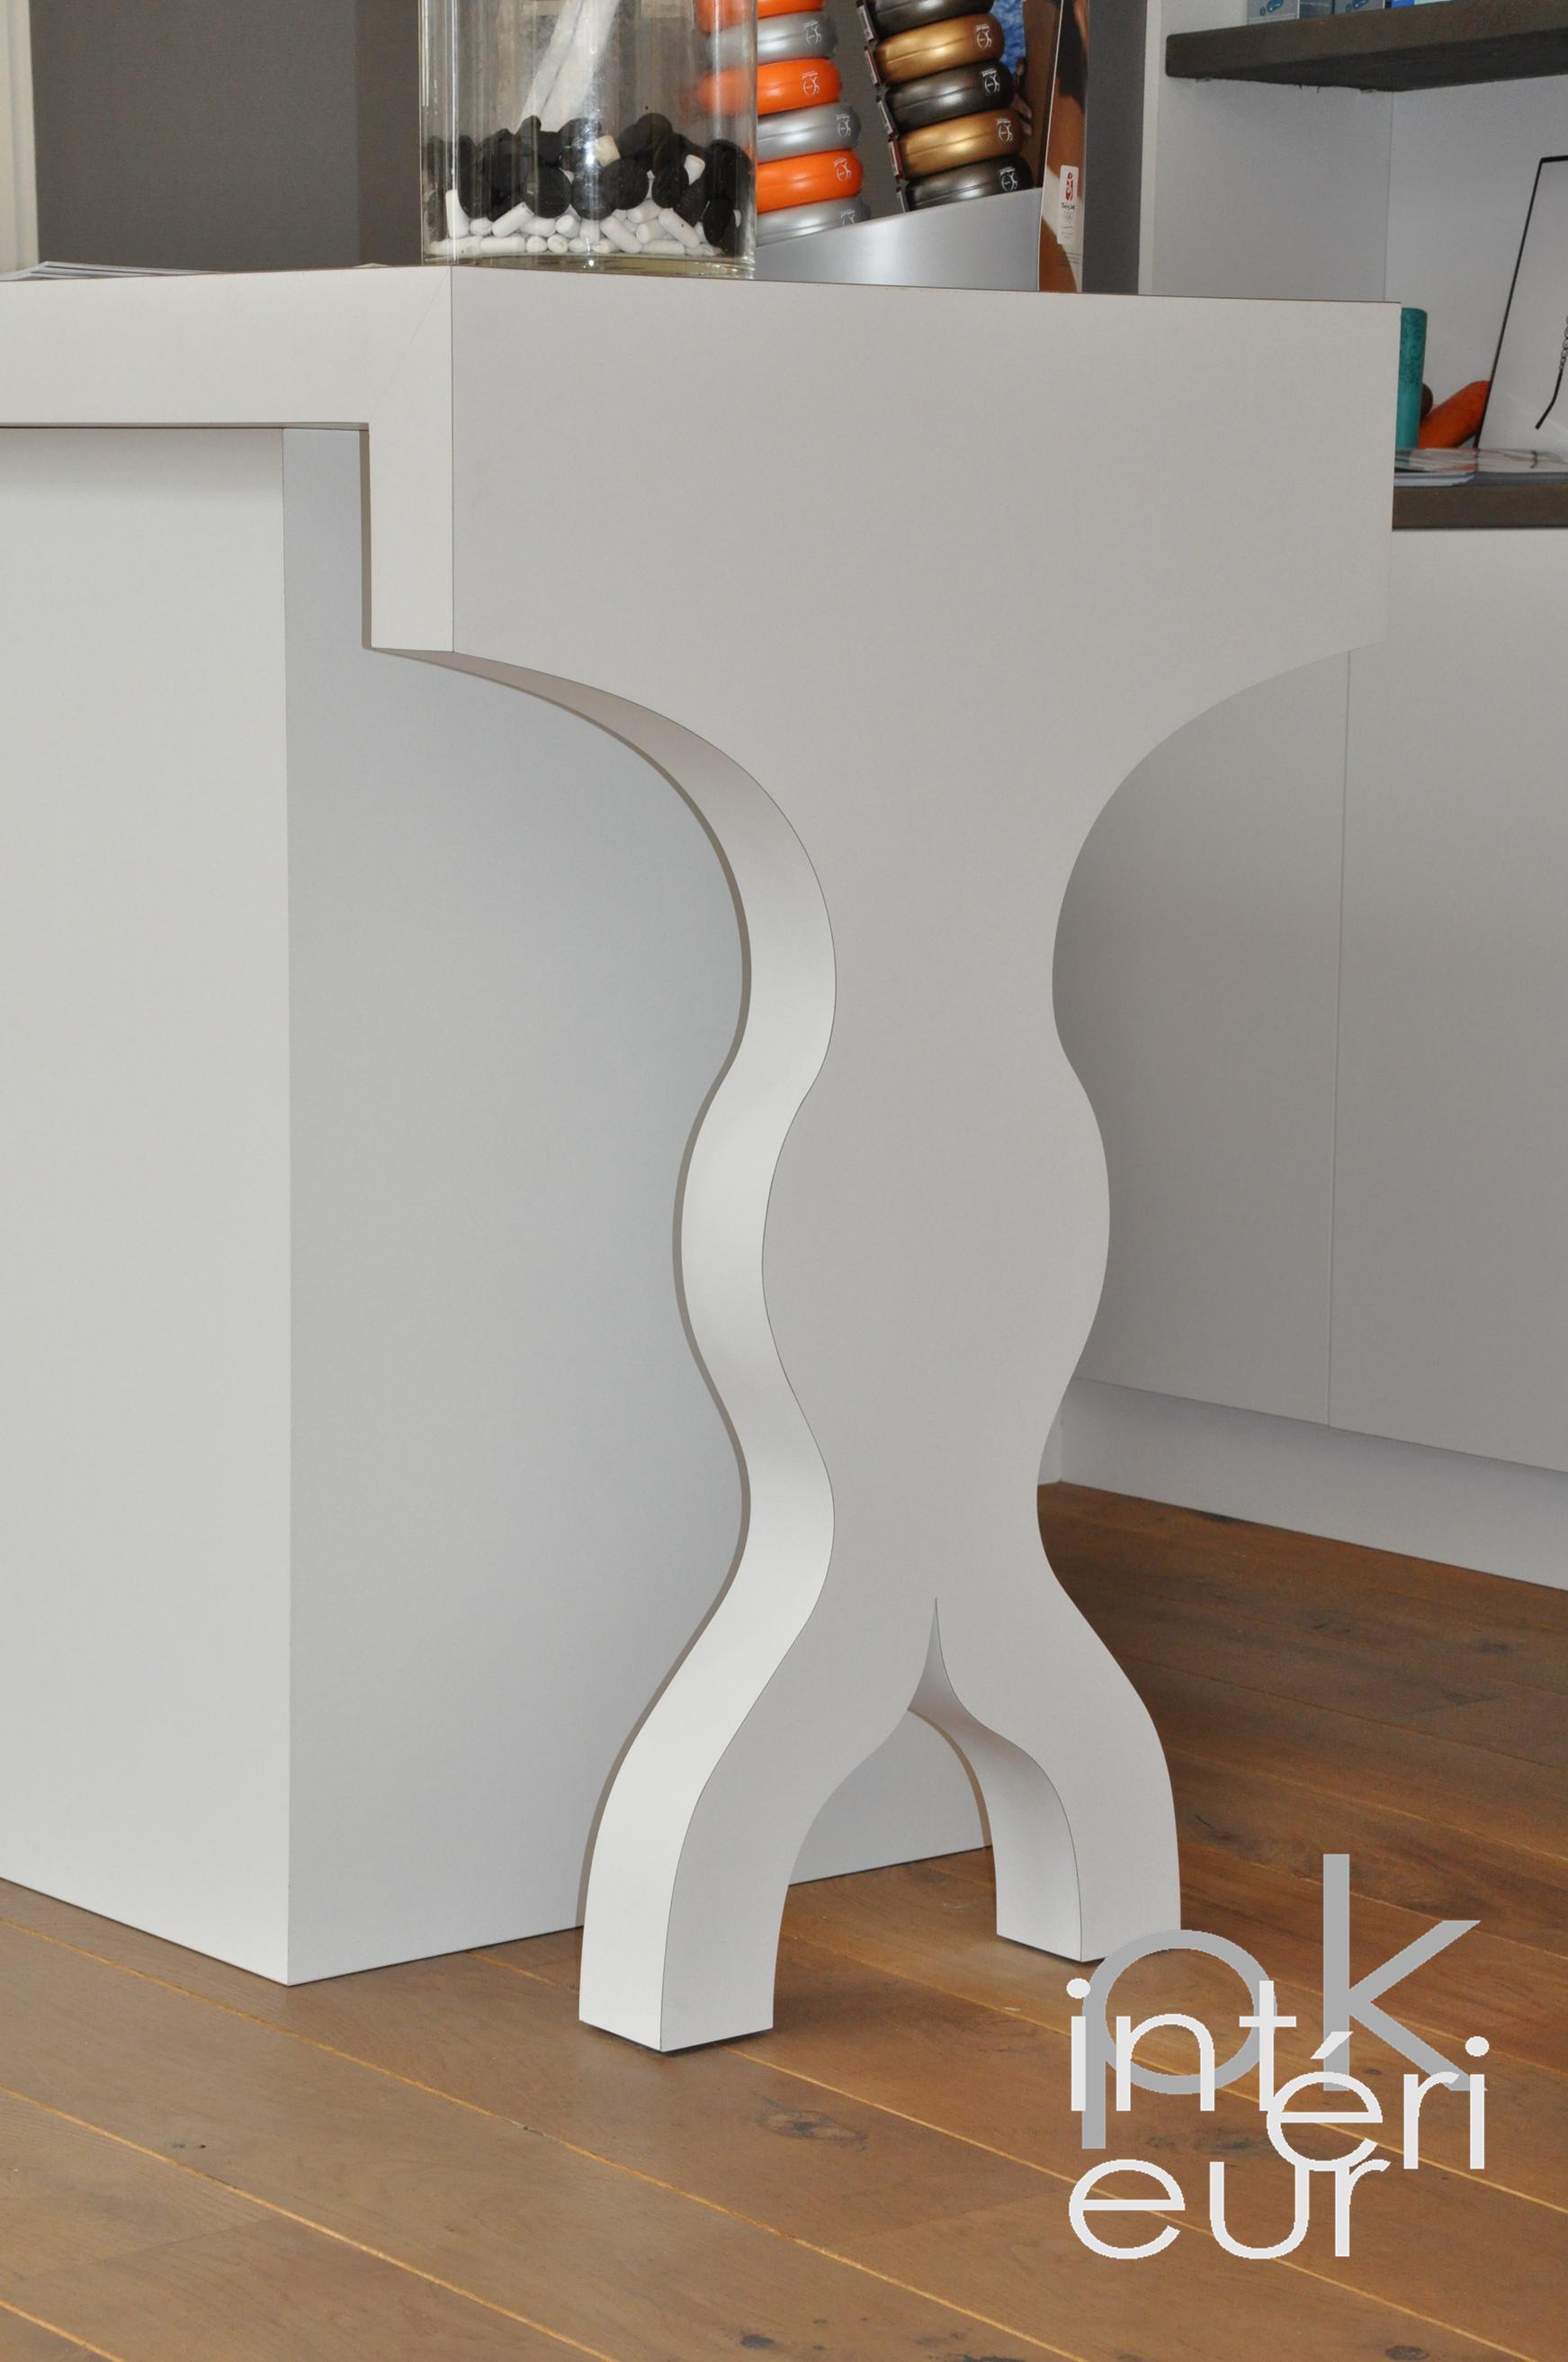 slaapkamer meubels nijmegen ~ lactate for ., Deco ideeën